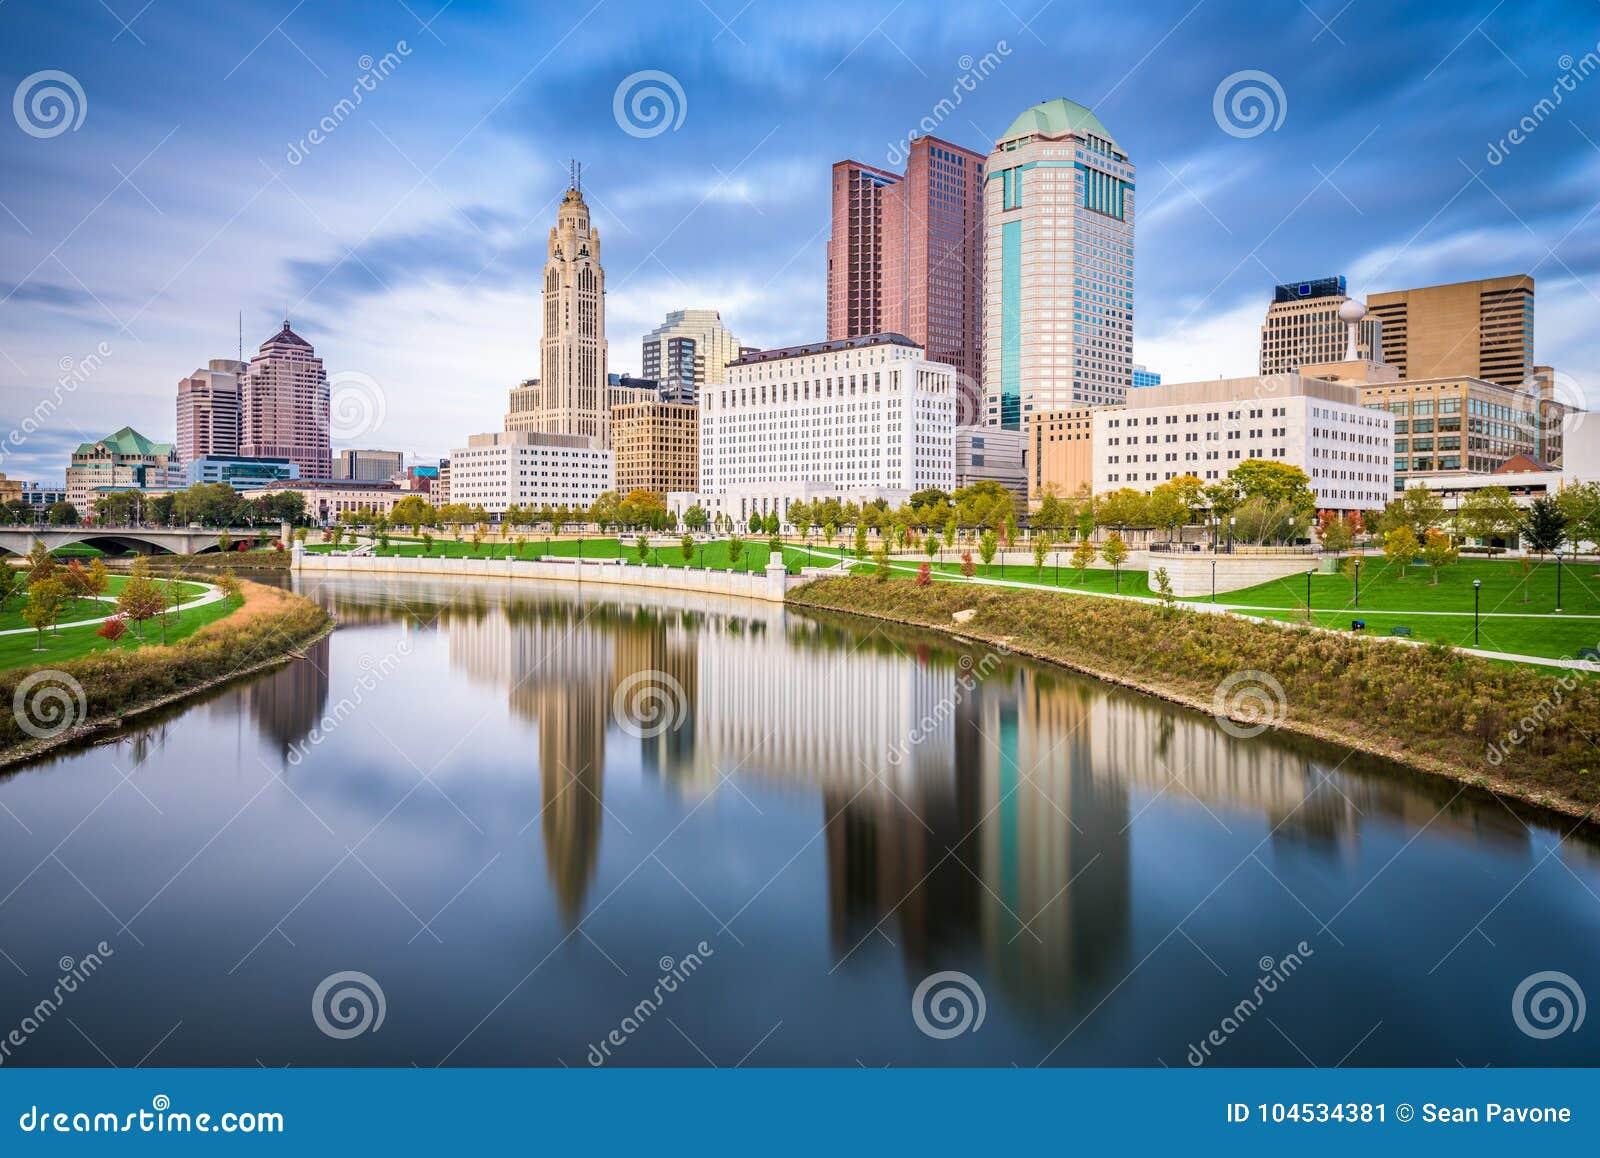 Kolumb, Ohio, usa